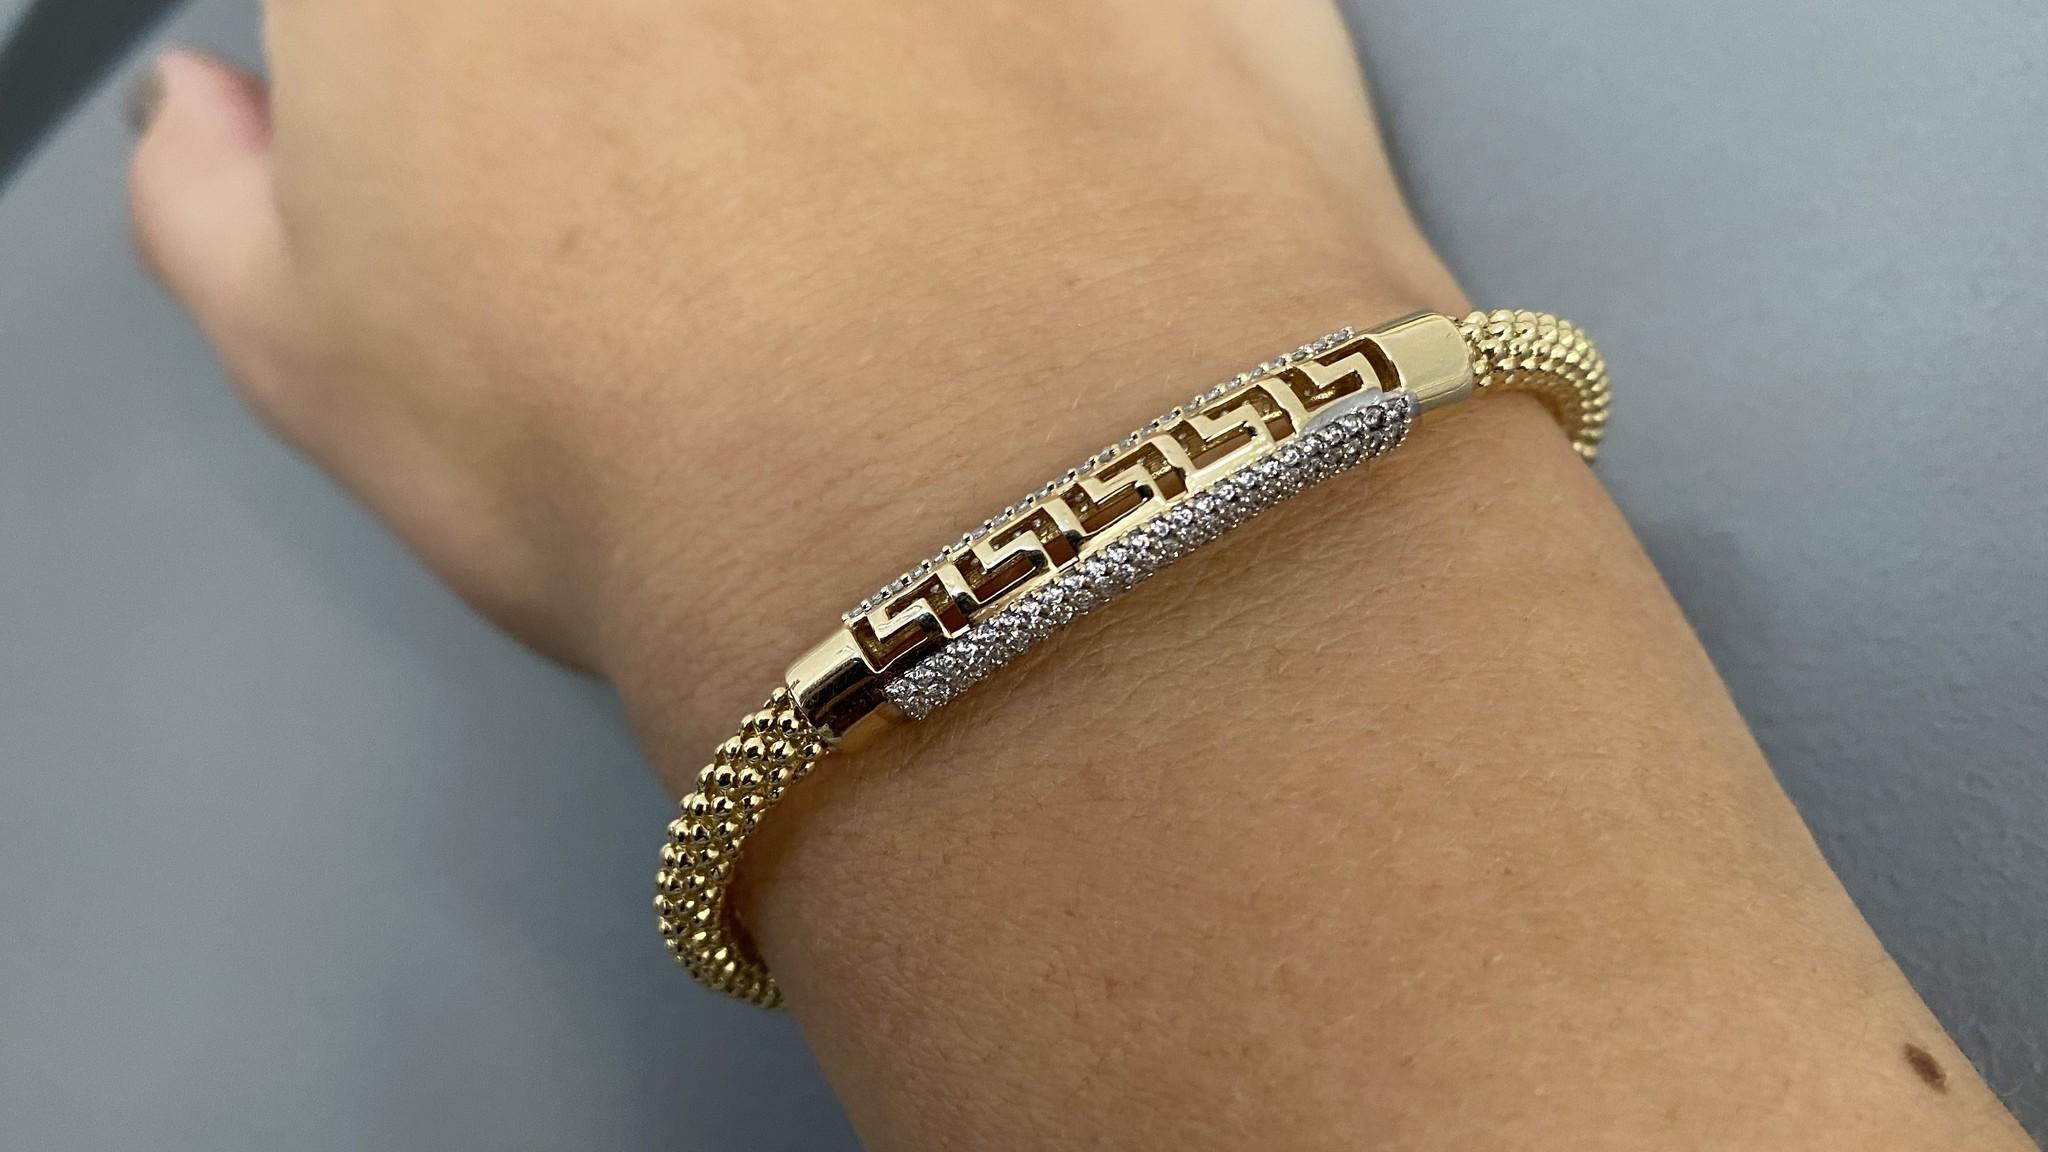 Armband halve slavenband versace met zirkonia's en flexibele boto ketti-4